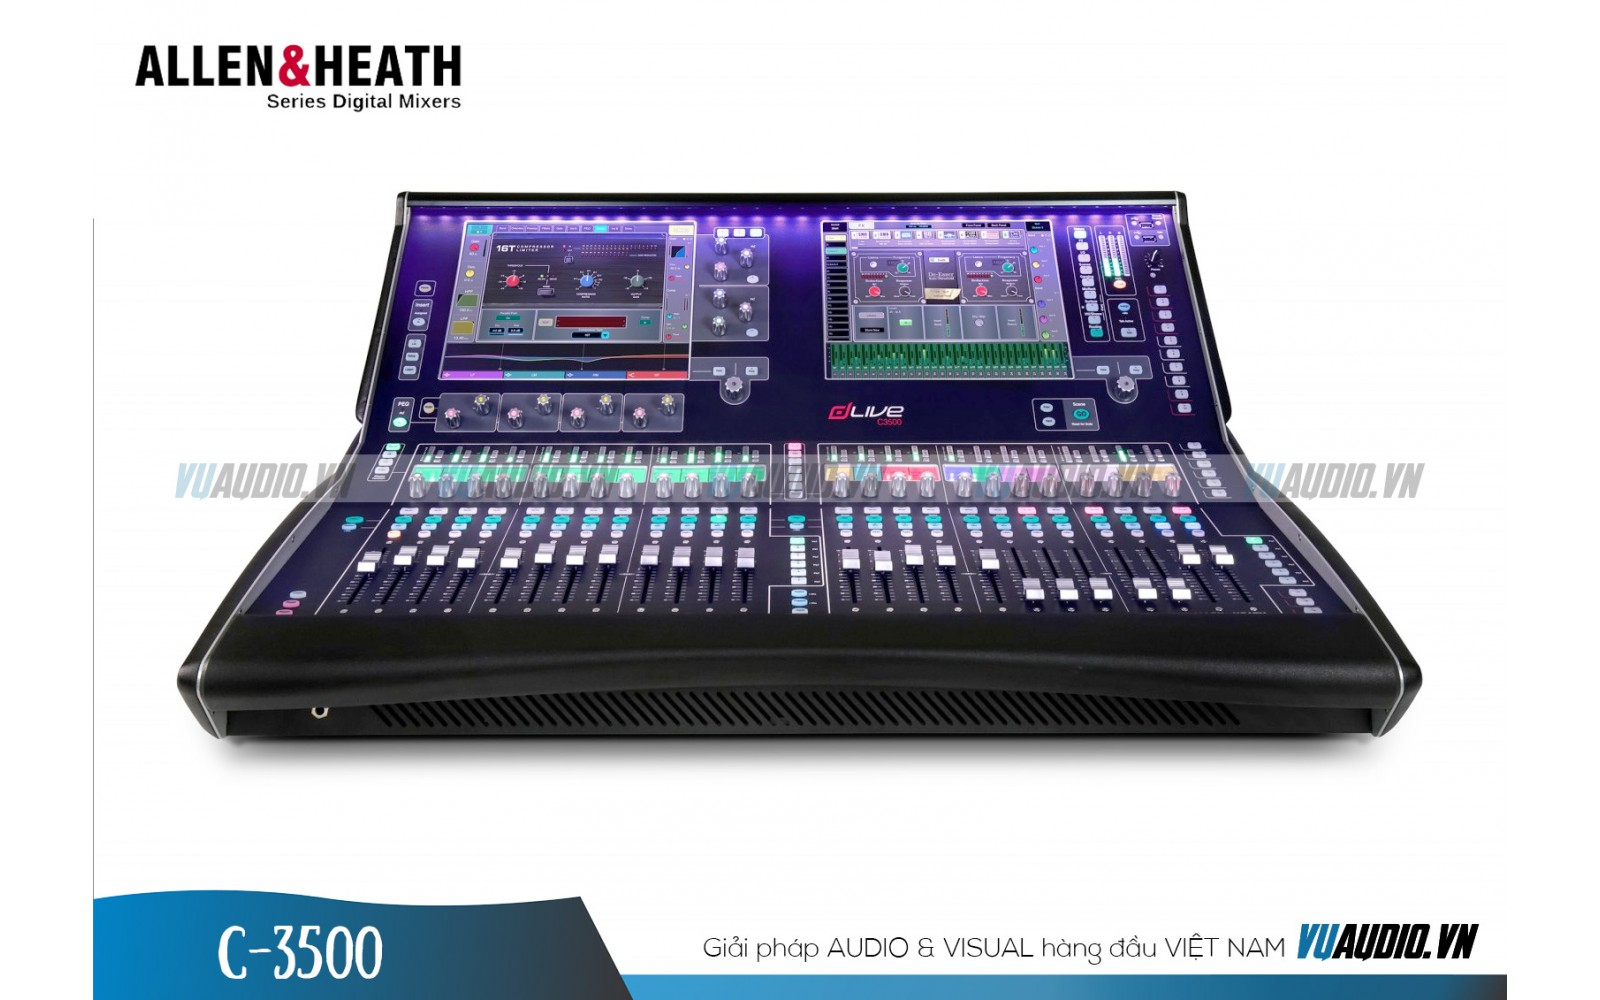 ALLEN & HEATH DLIVE C3500